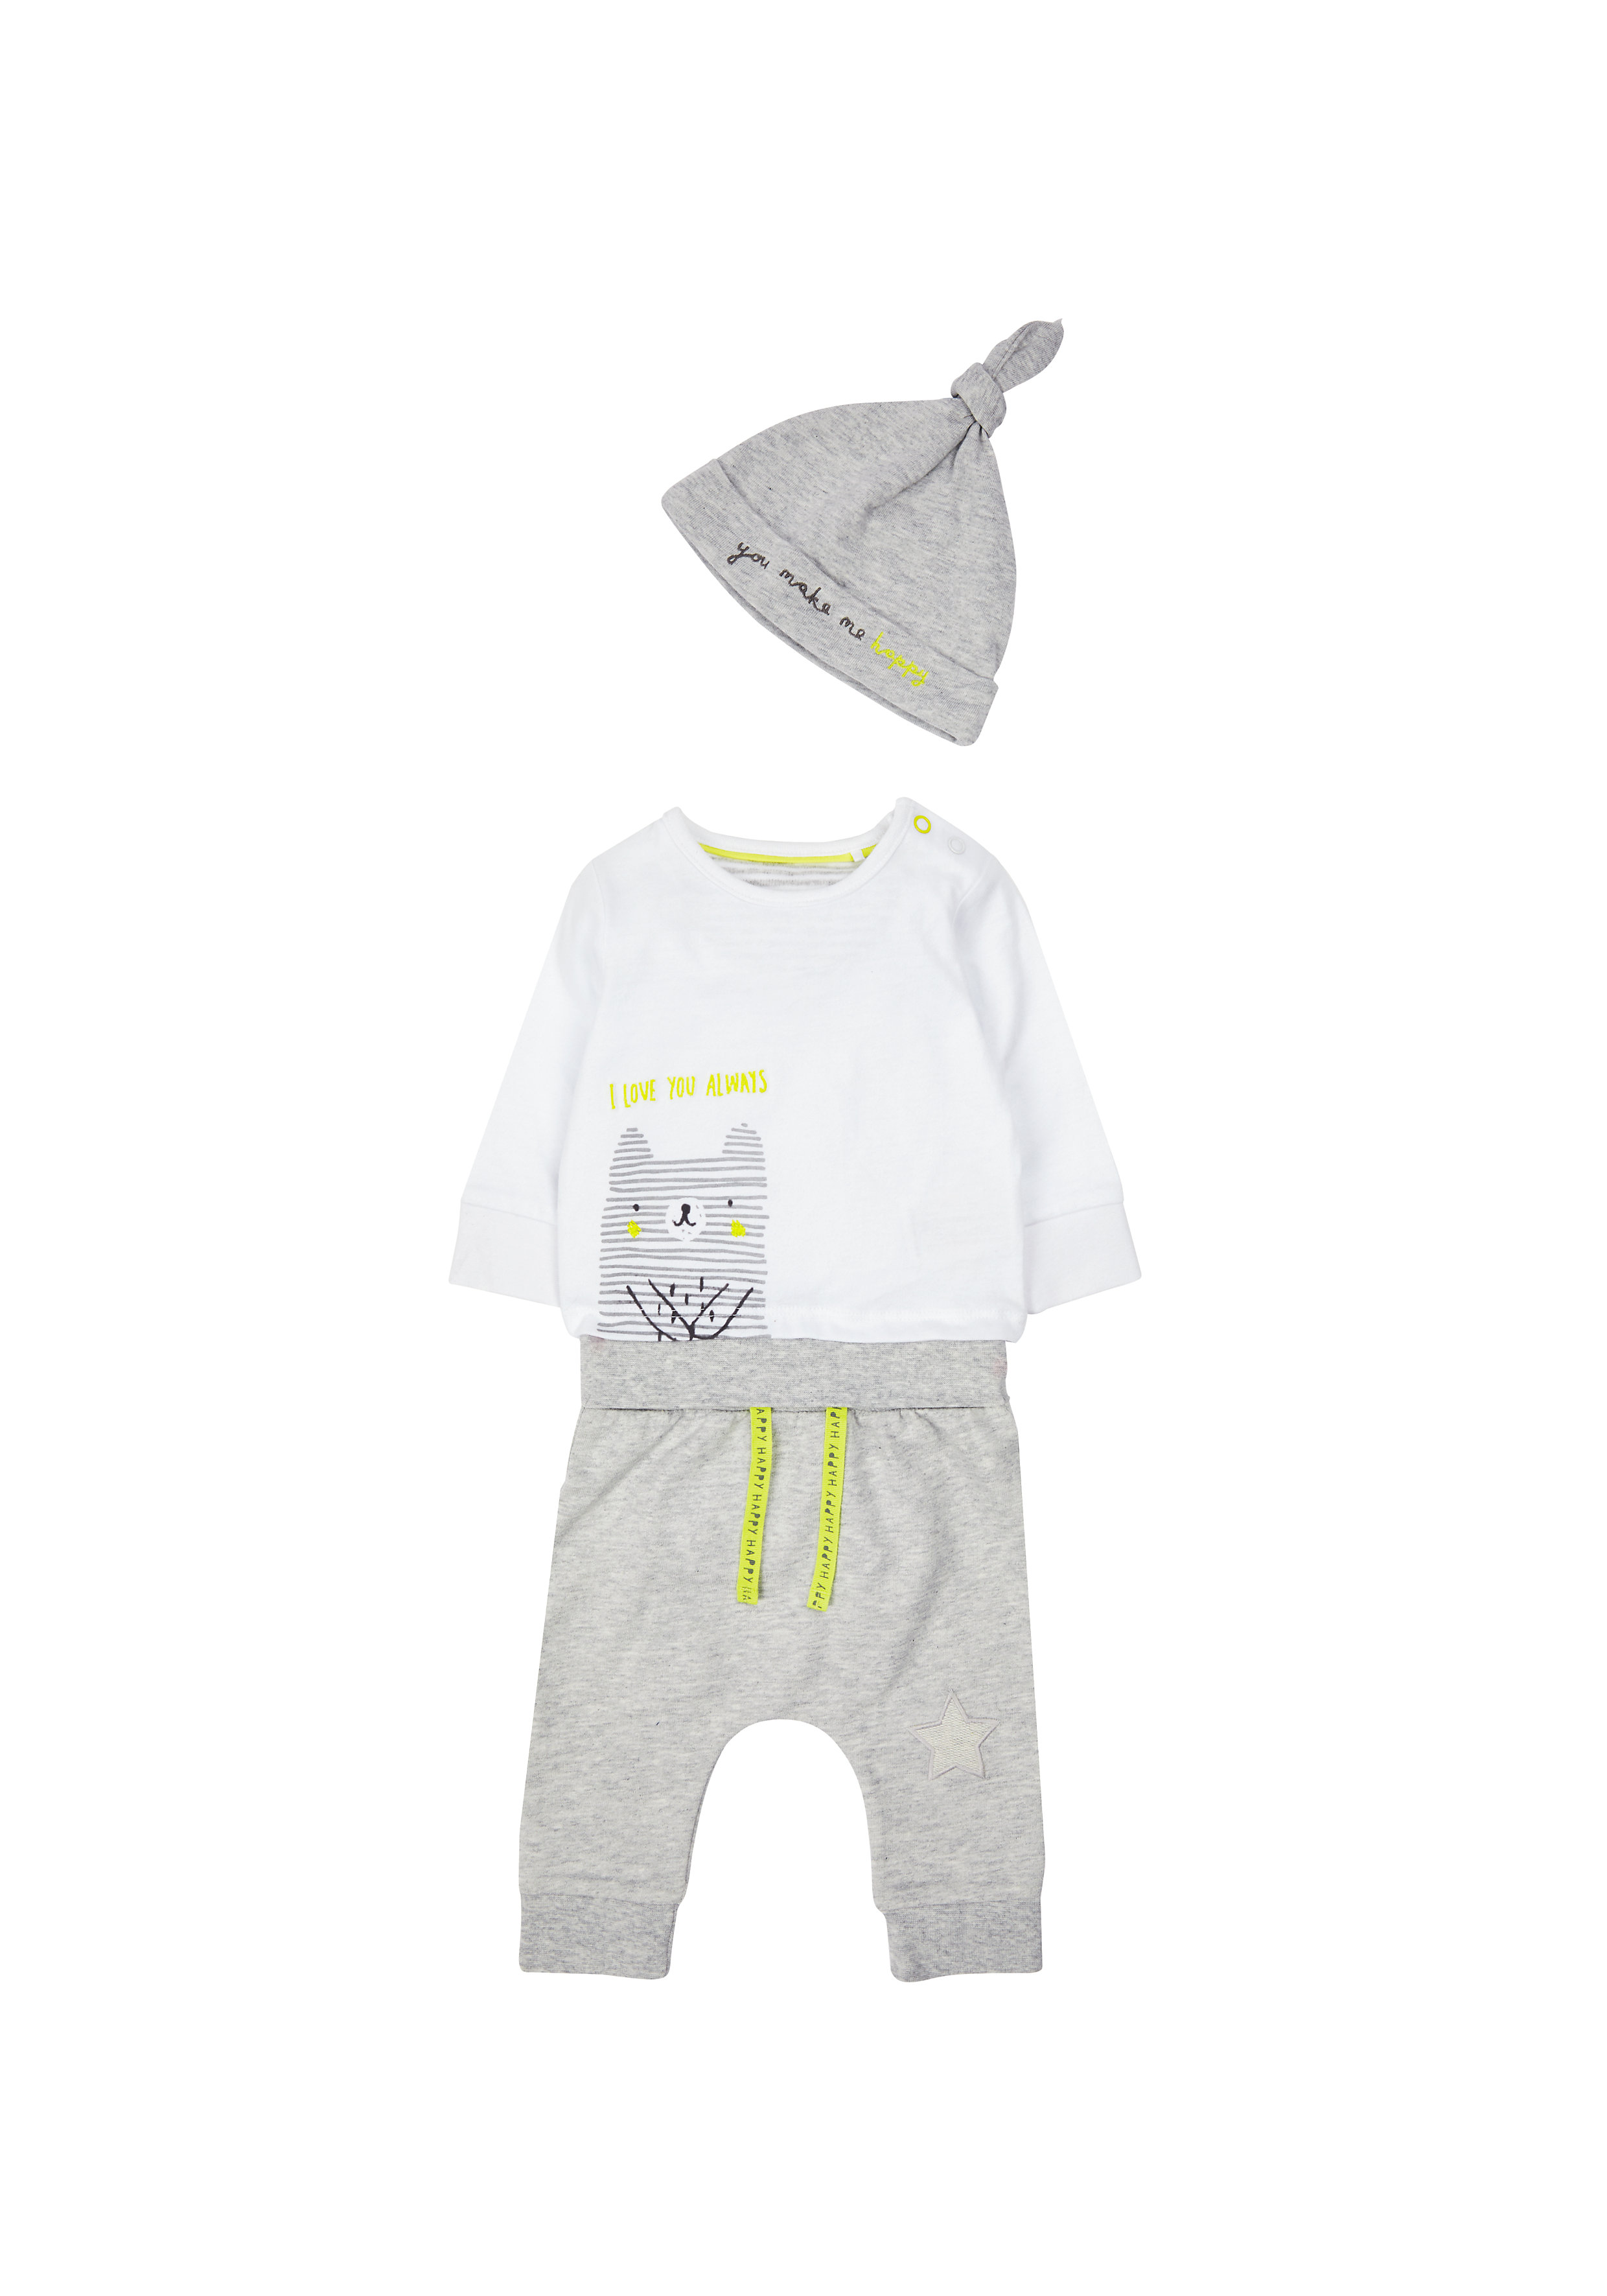 Mothercare | Unisex Grey Bear Bodysuit, Jogger And Hat Set - Grey